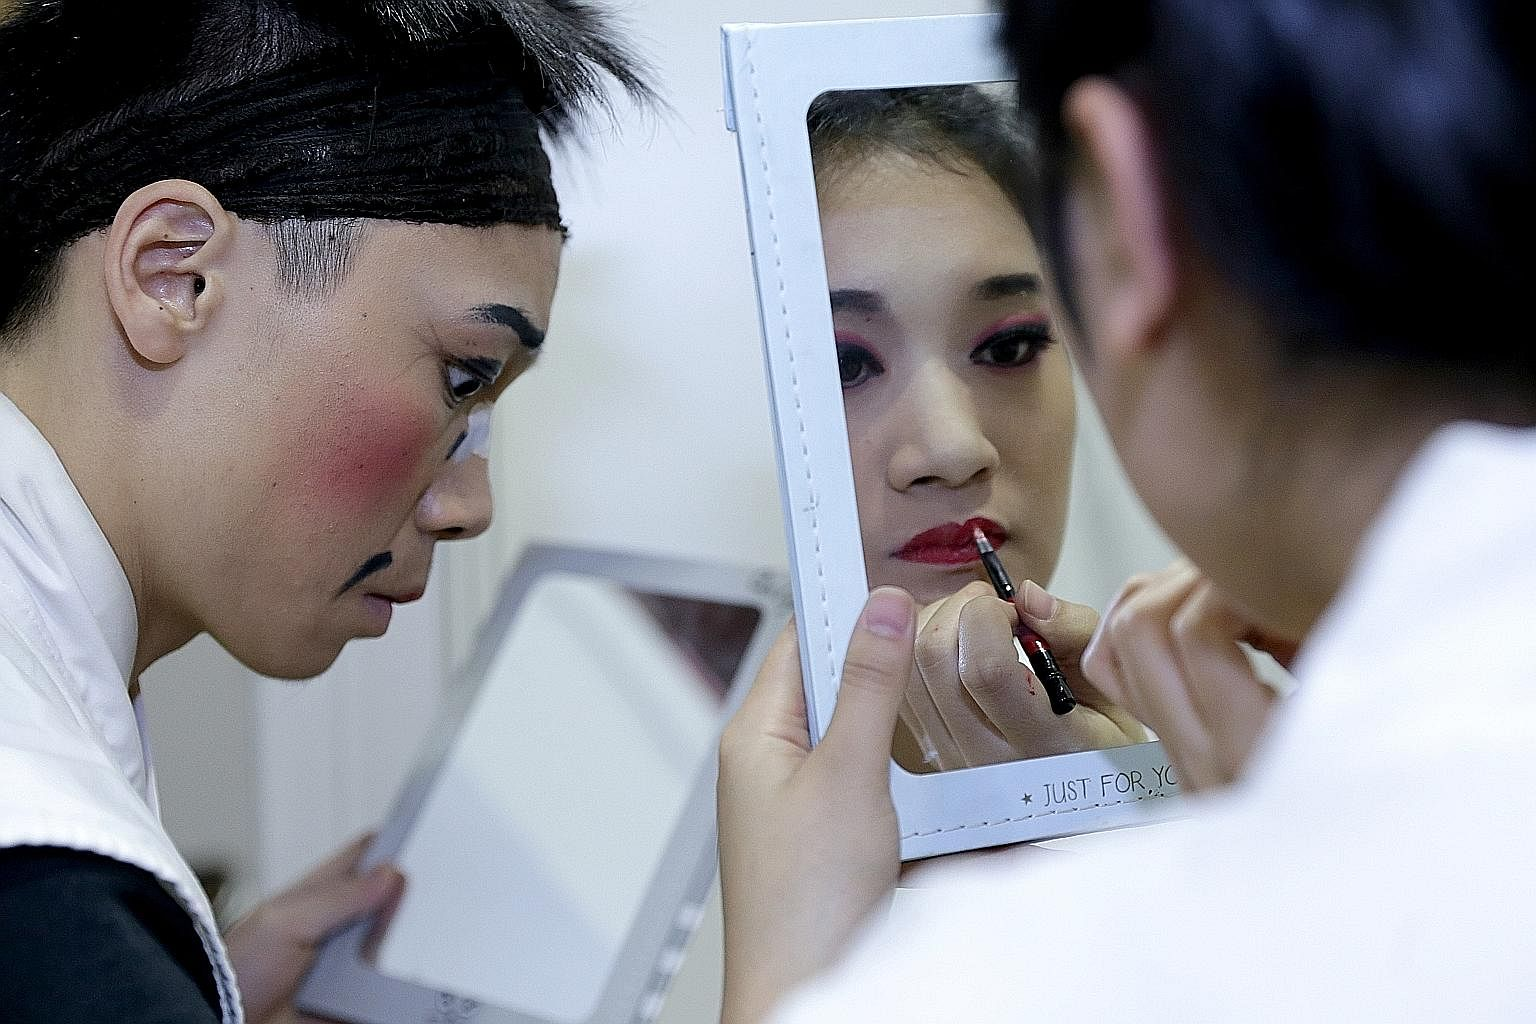 Members of the Xiao Mei Hua Opera Troupe preparing back